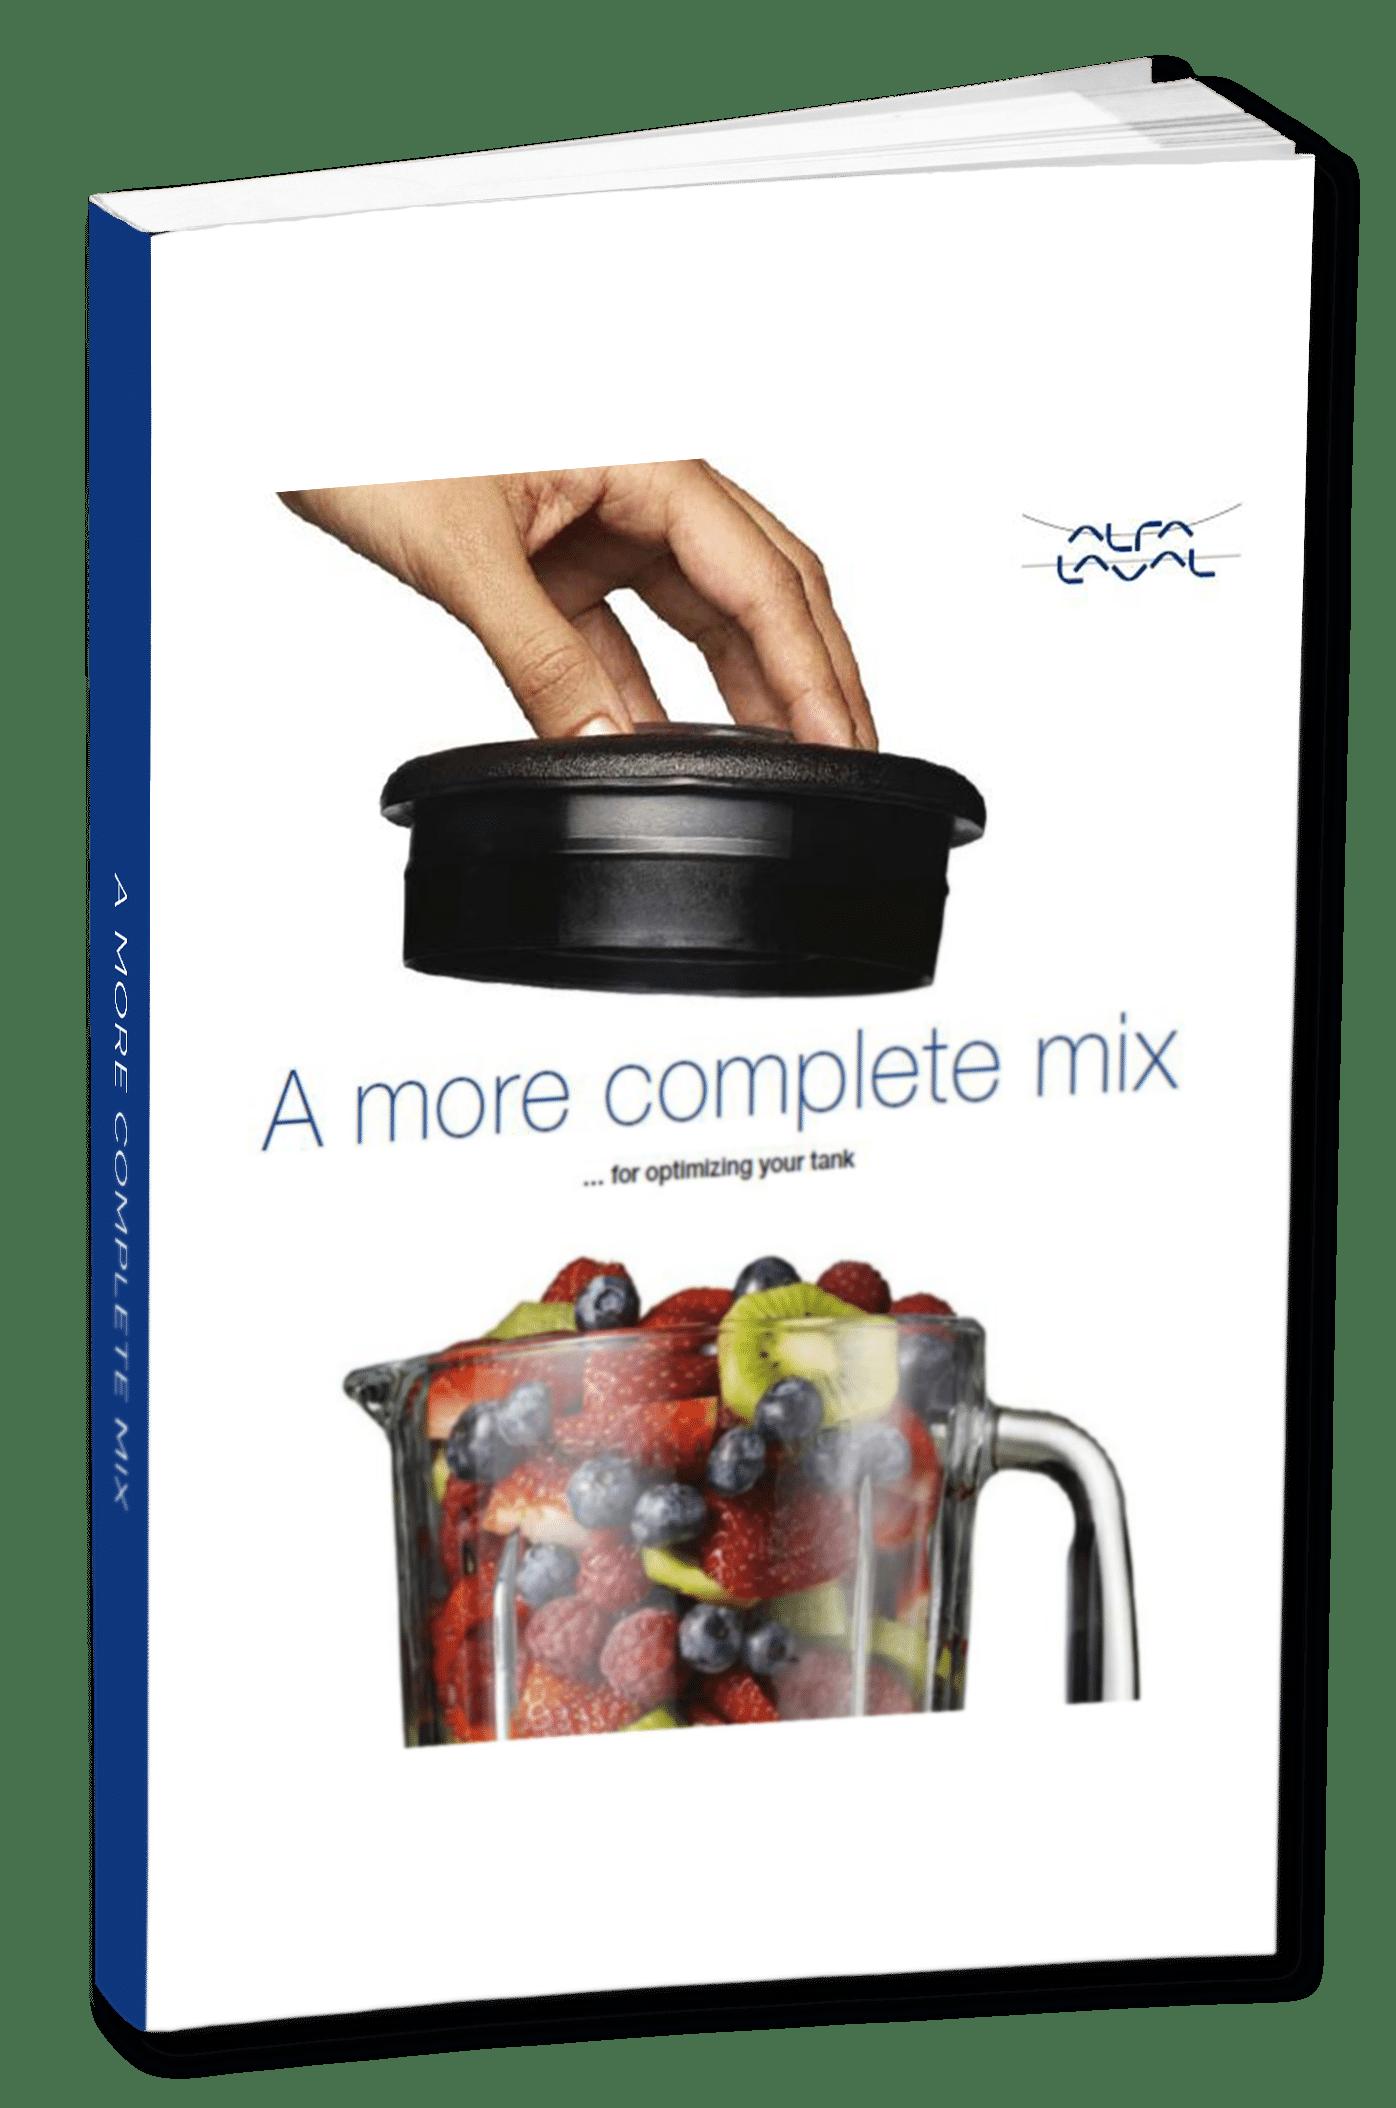 a more complete mix brochure